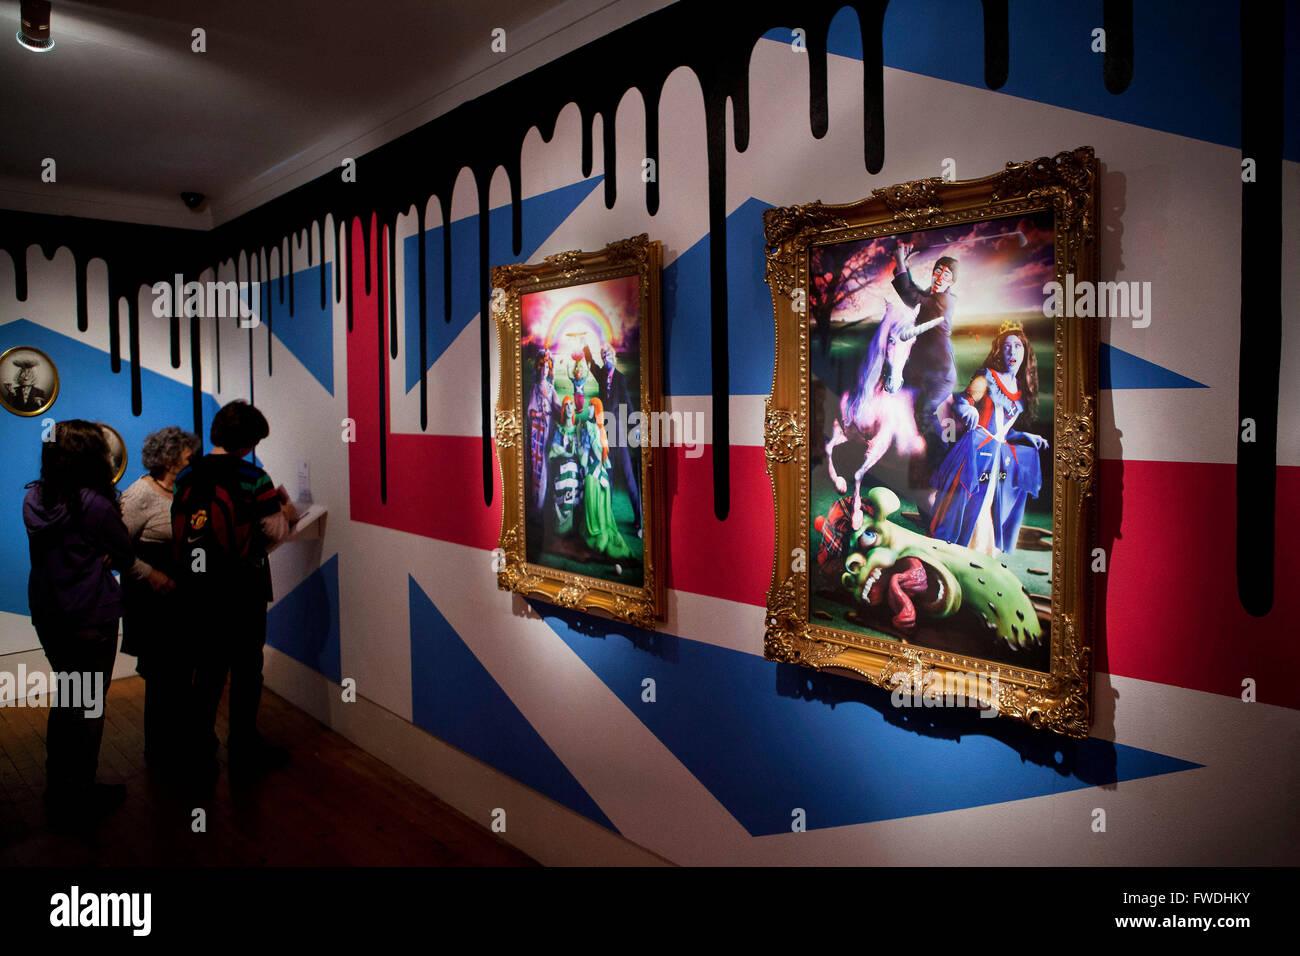 Edinburgh Festival: art exhibition - Stock Image